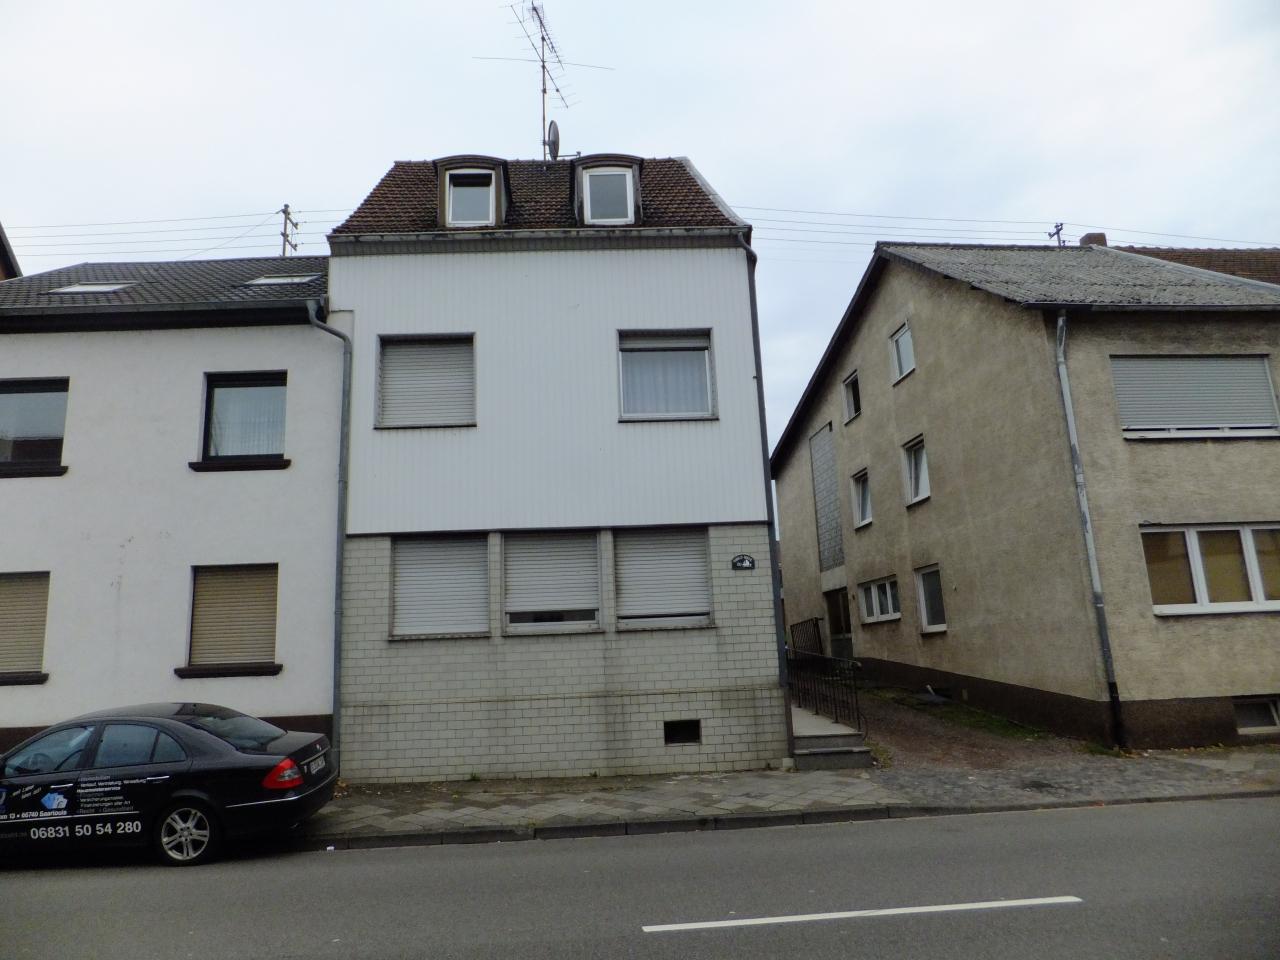 Osbild-House  12.08.2018 - D- 66740 Saarlouis, 2 x Appartement for 10 - 12 people.